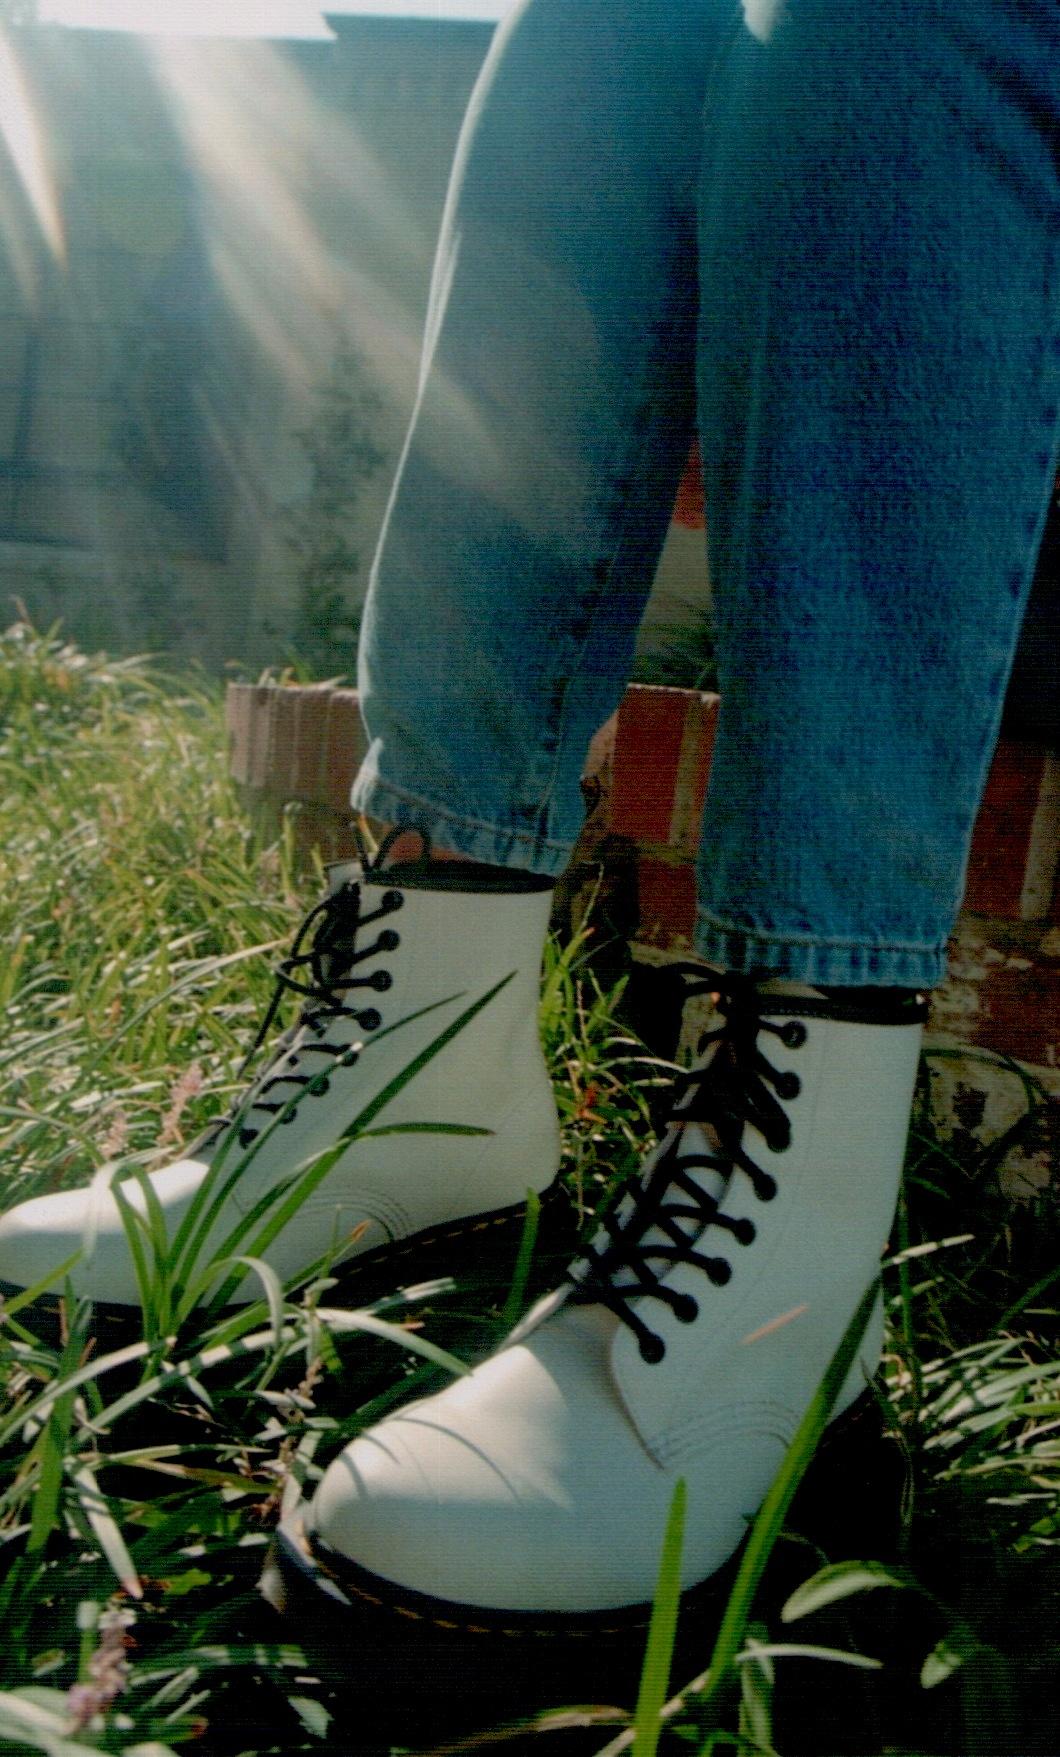 Dr Martins-British-Boots-Fioruci-Denim-Stay Boutique Live-BLLA-Boutique Community